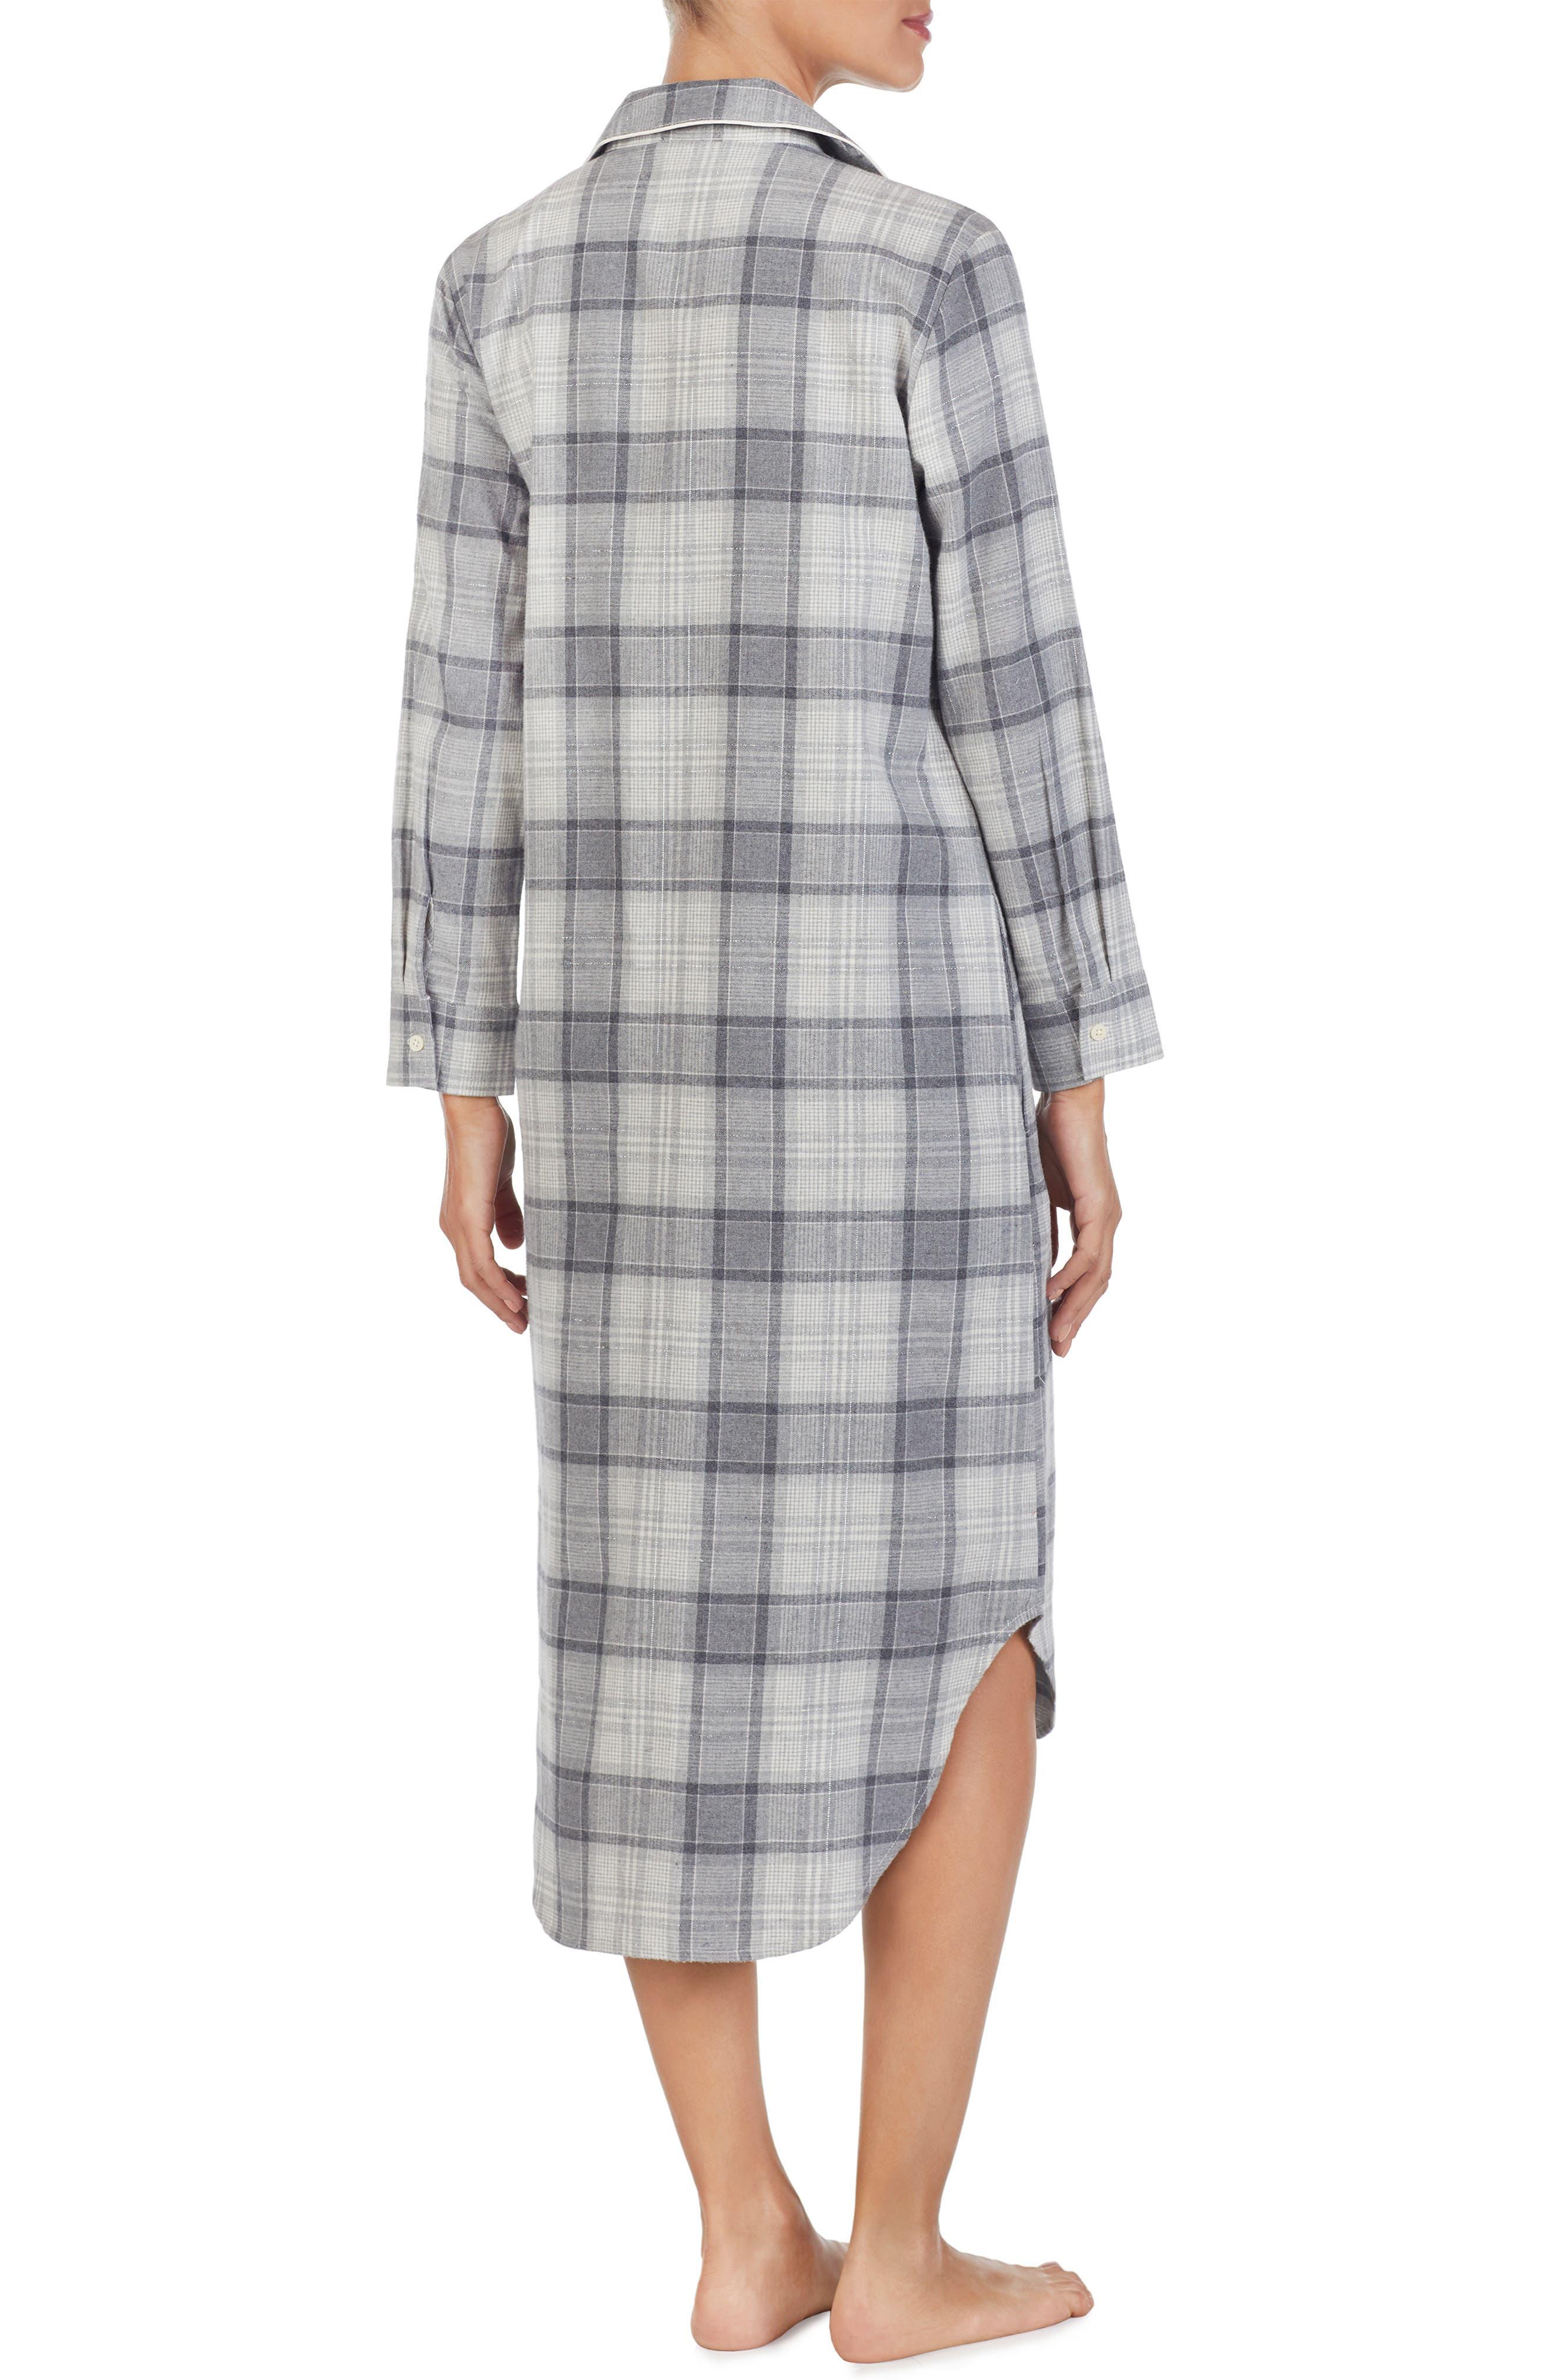 Plaid Flannel Sleep Shirt,                             Alternate thumbnail 2, color,                             GREY PLAID